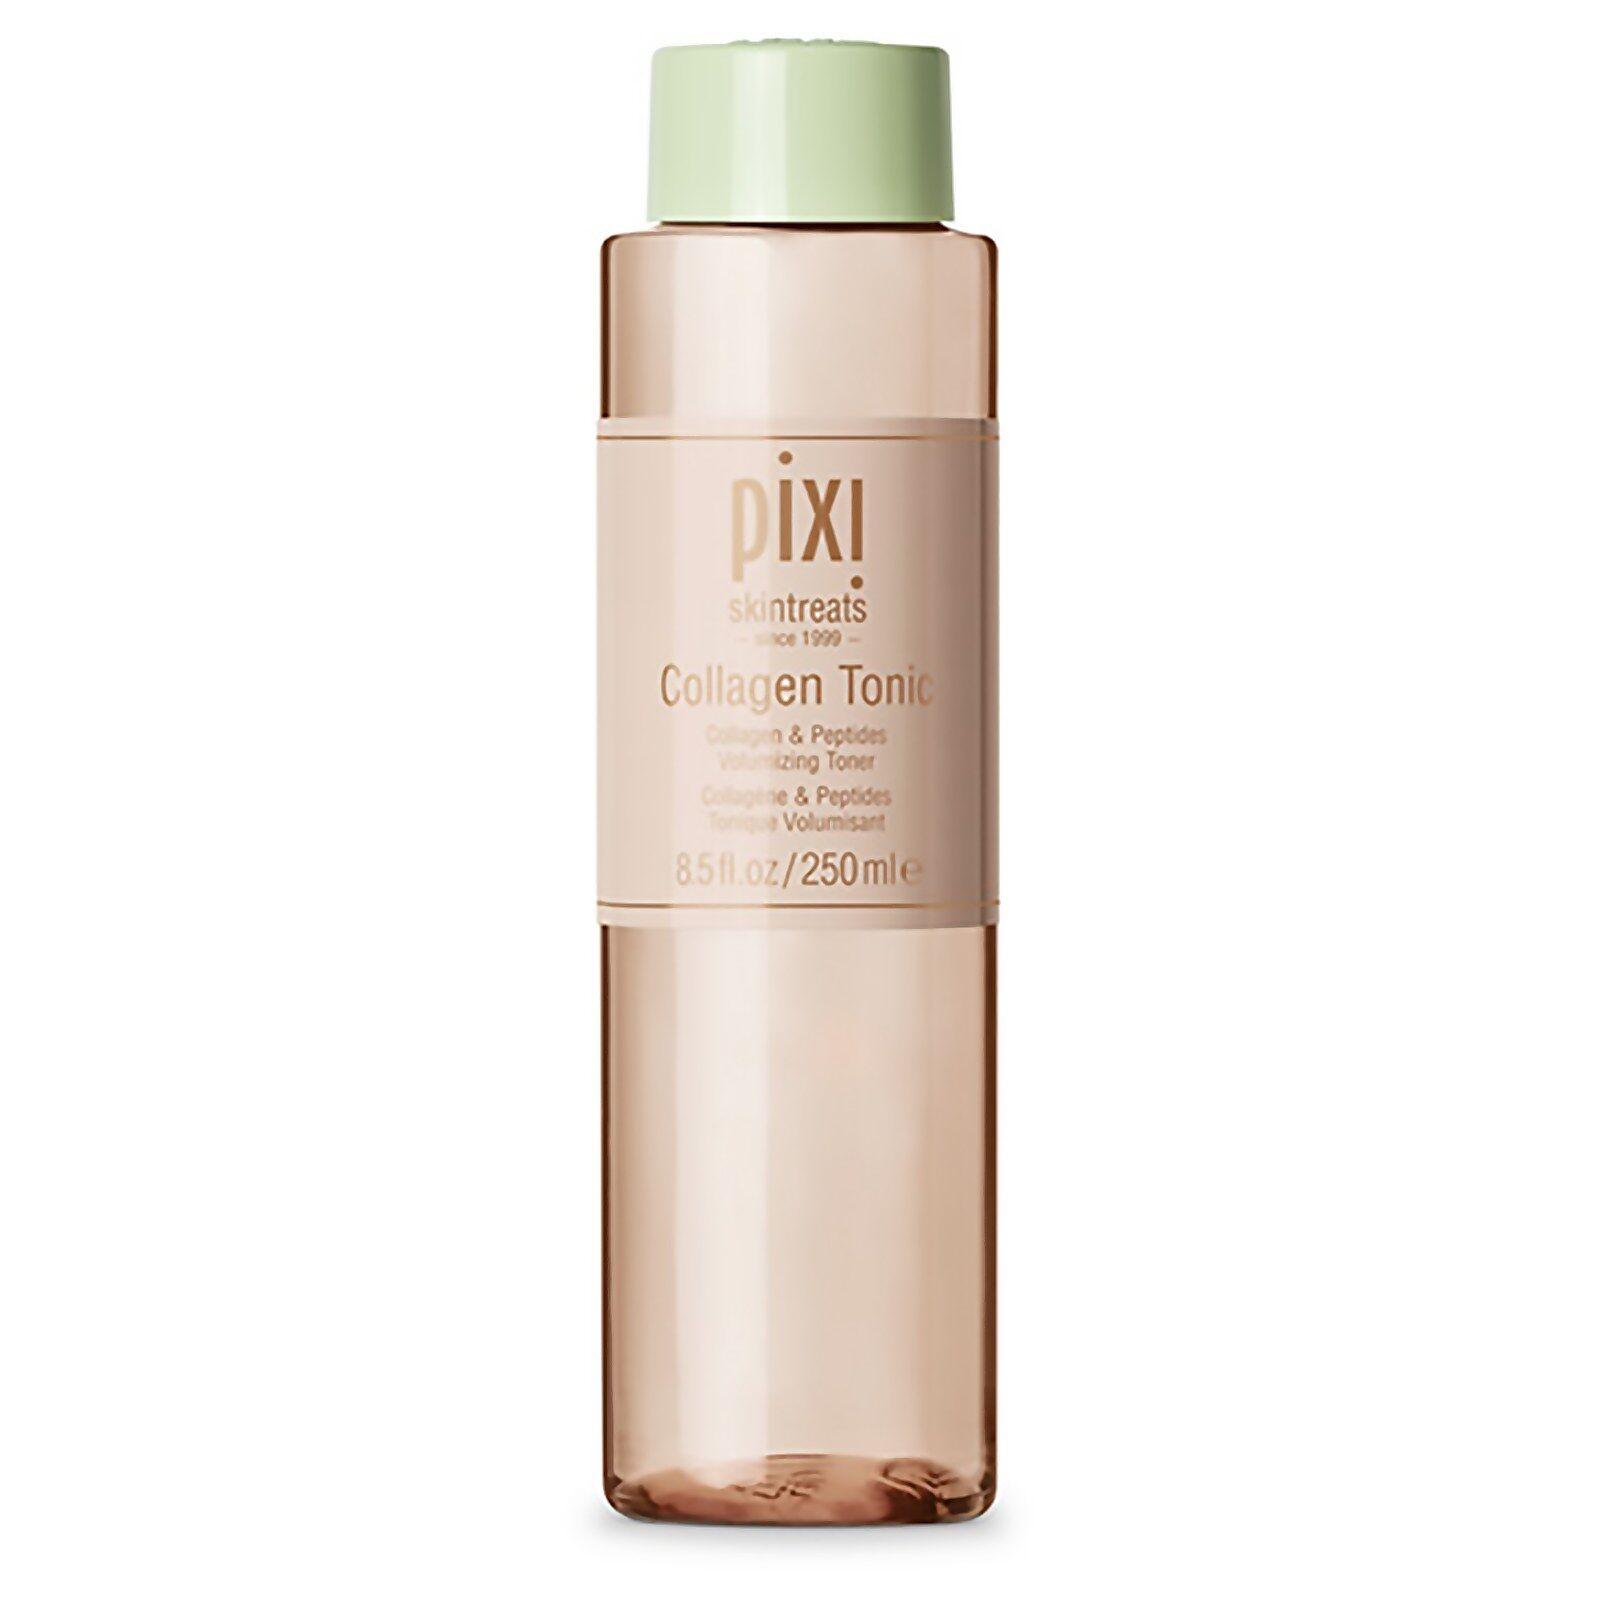 PIXI Collagen Tonic 250ml (Worth £25.00)